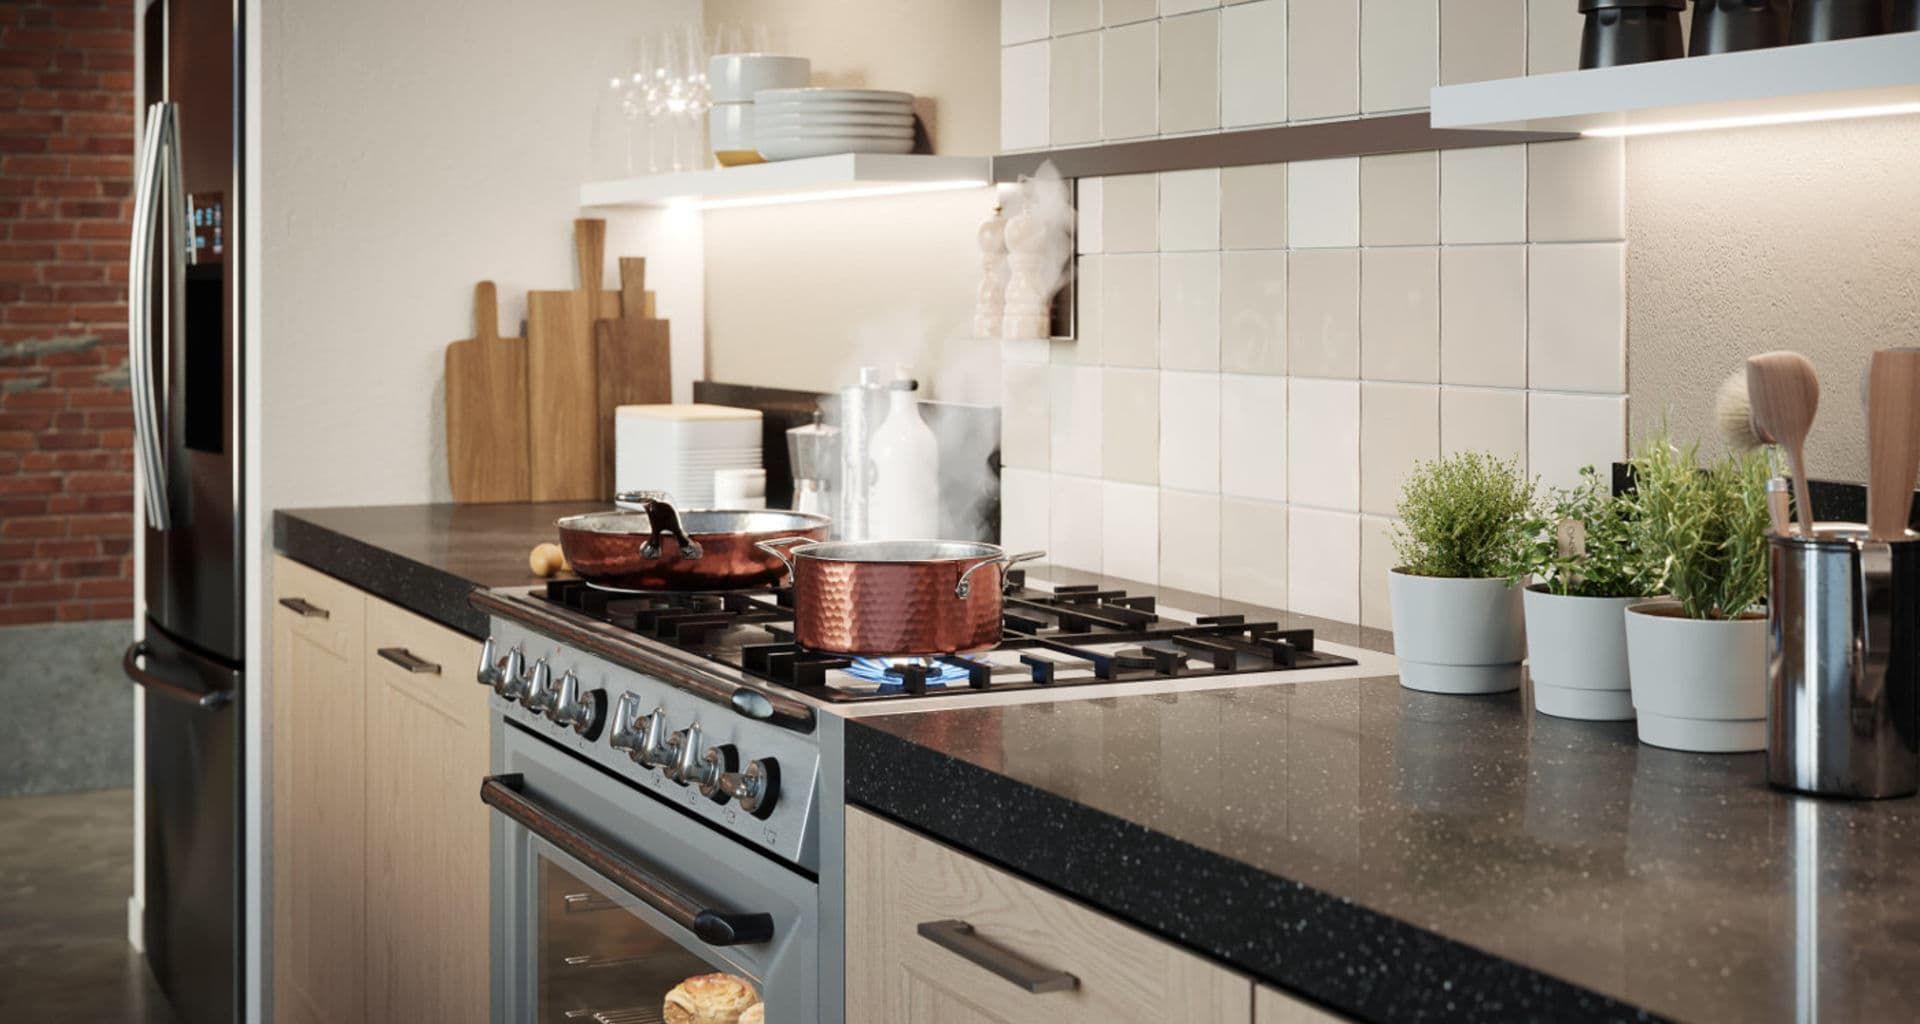 Keuken met marmer